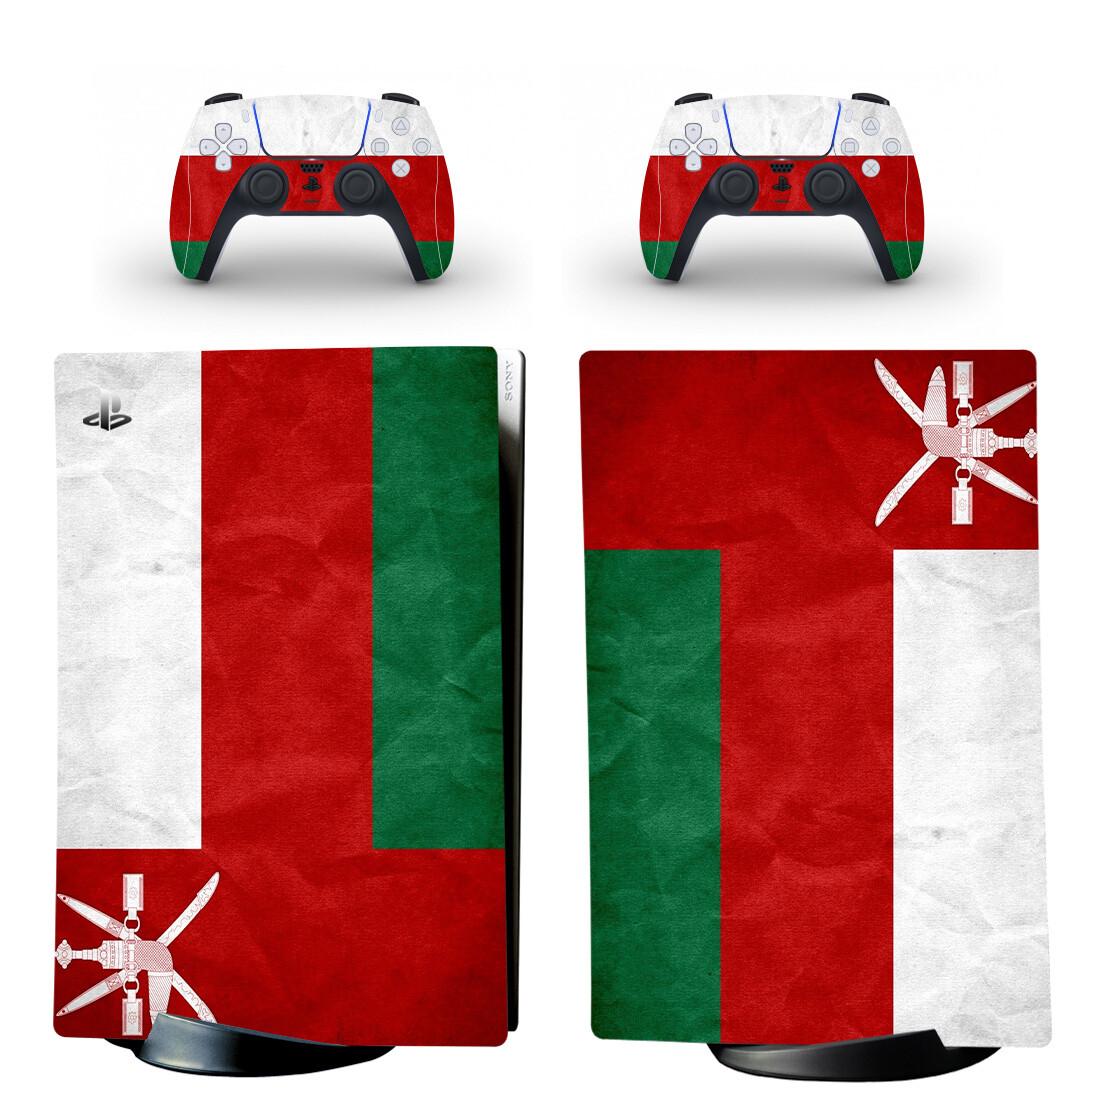 Flag Of Oman PS5 Digital Edition Skin Sticker Decal